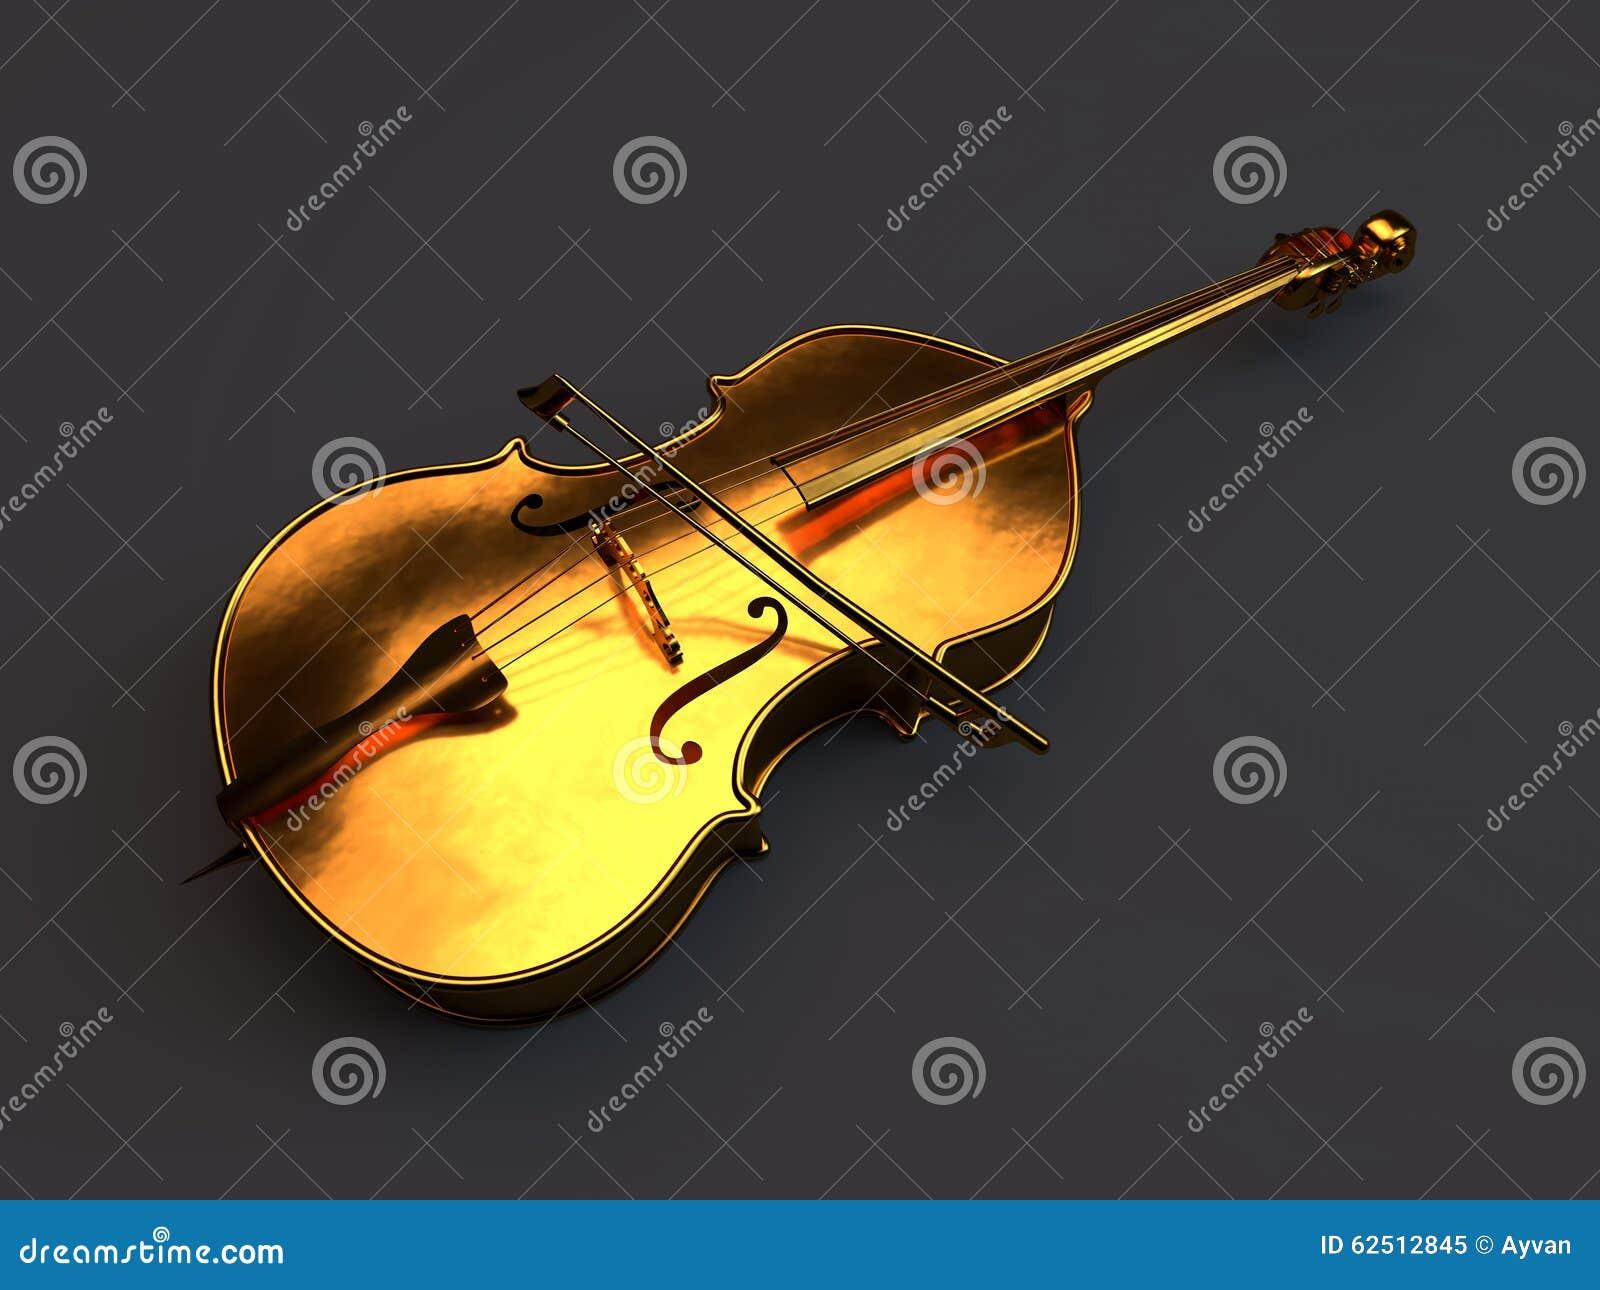 Cello cartoon cello player stock photography image 32561422 - Golden Cello Isolated On White Royalty Free Stock Photo